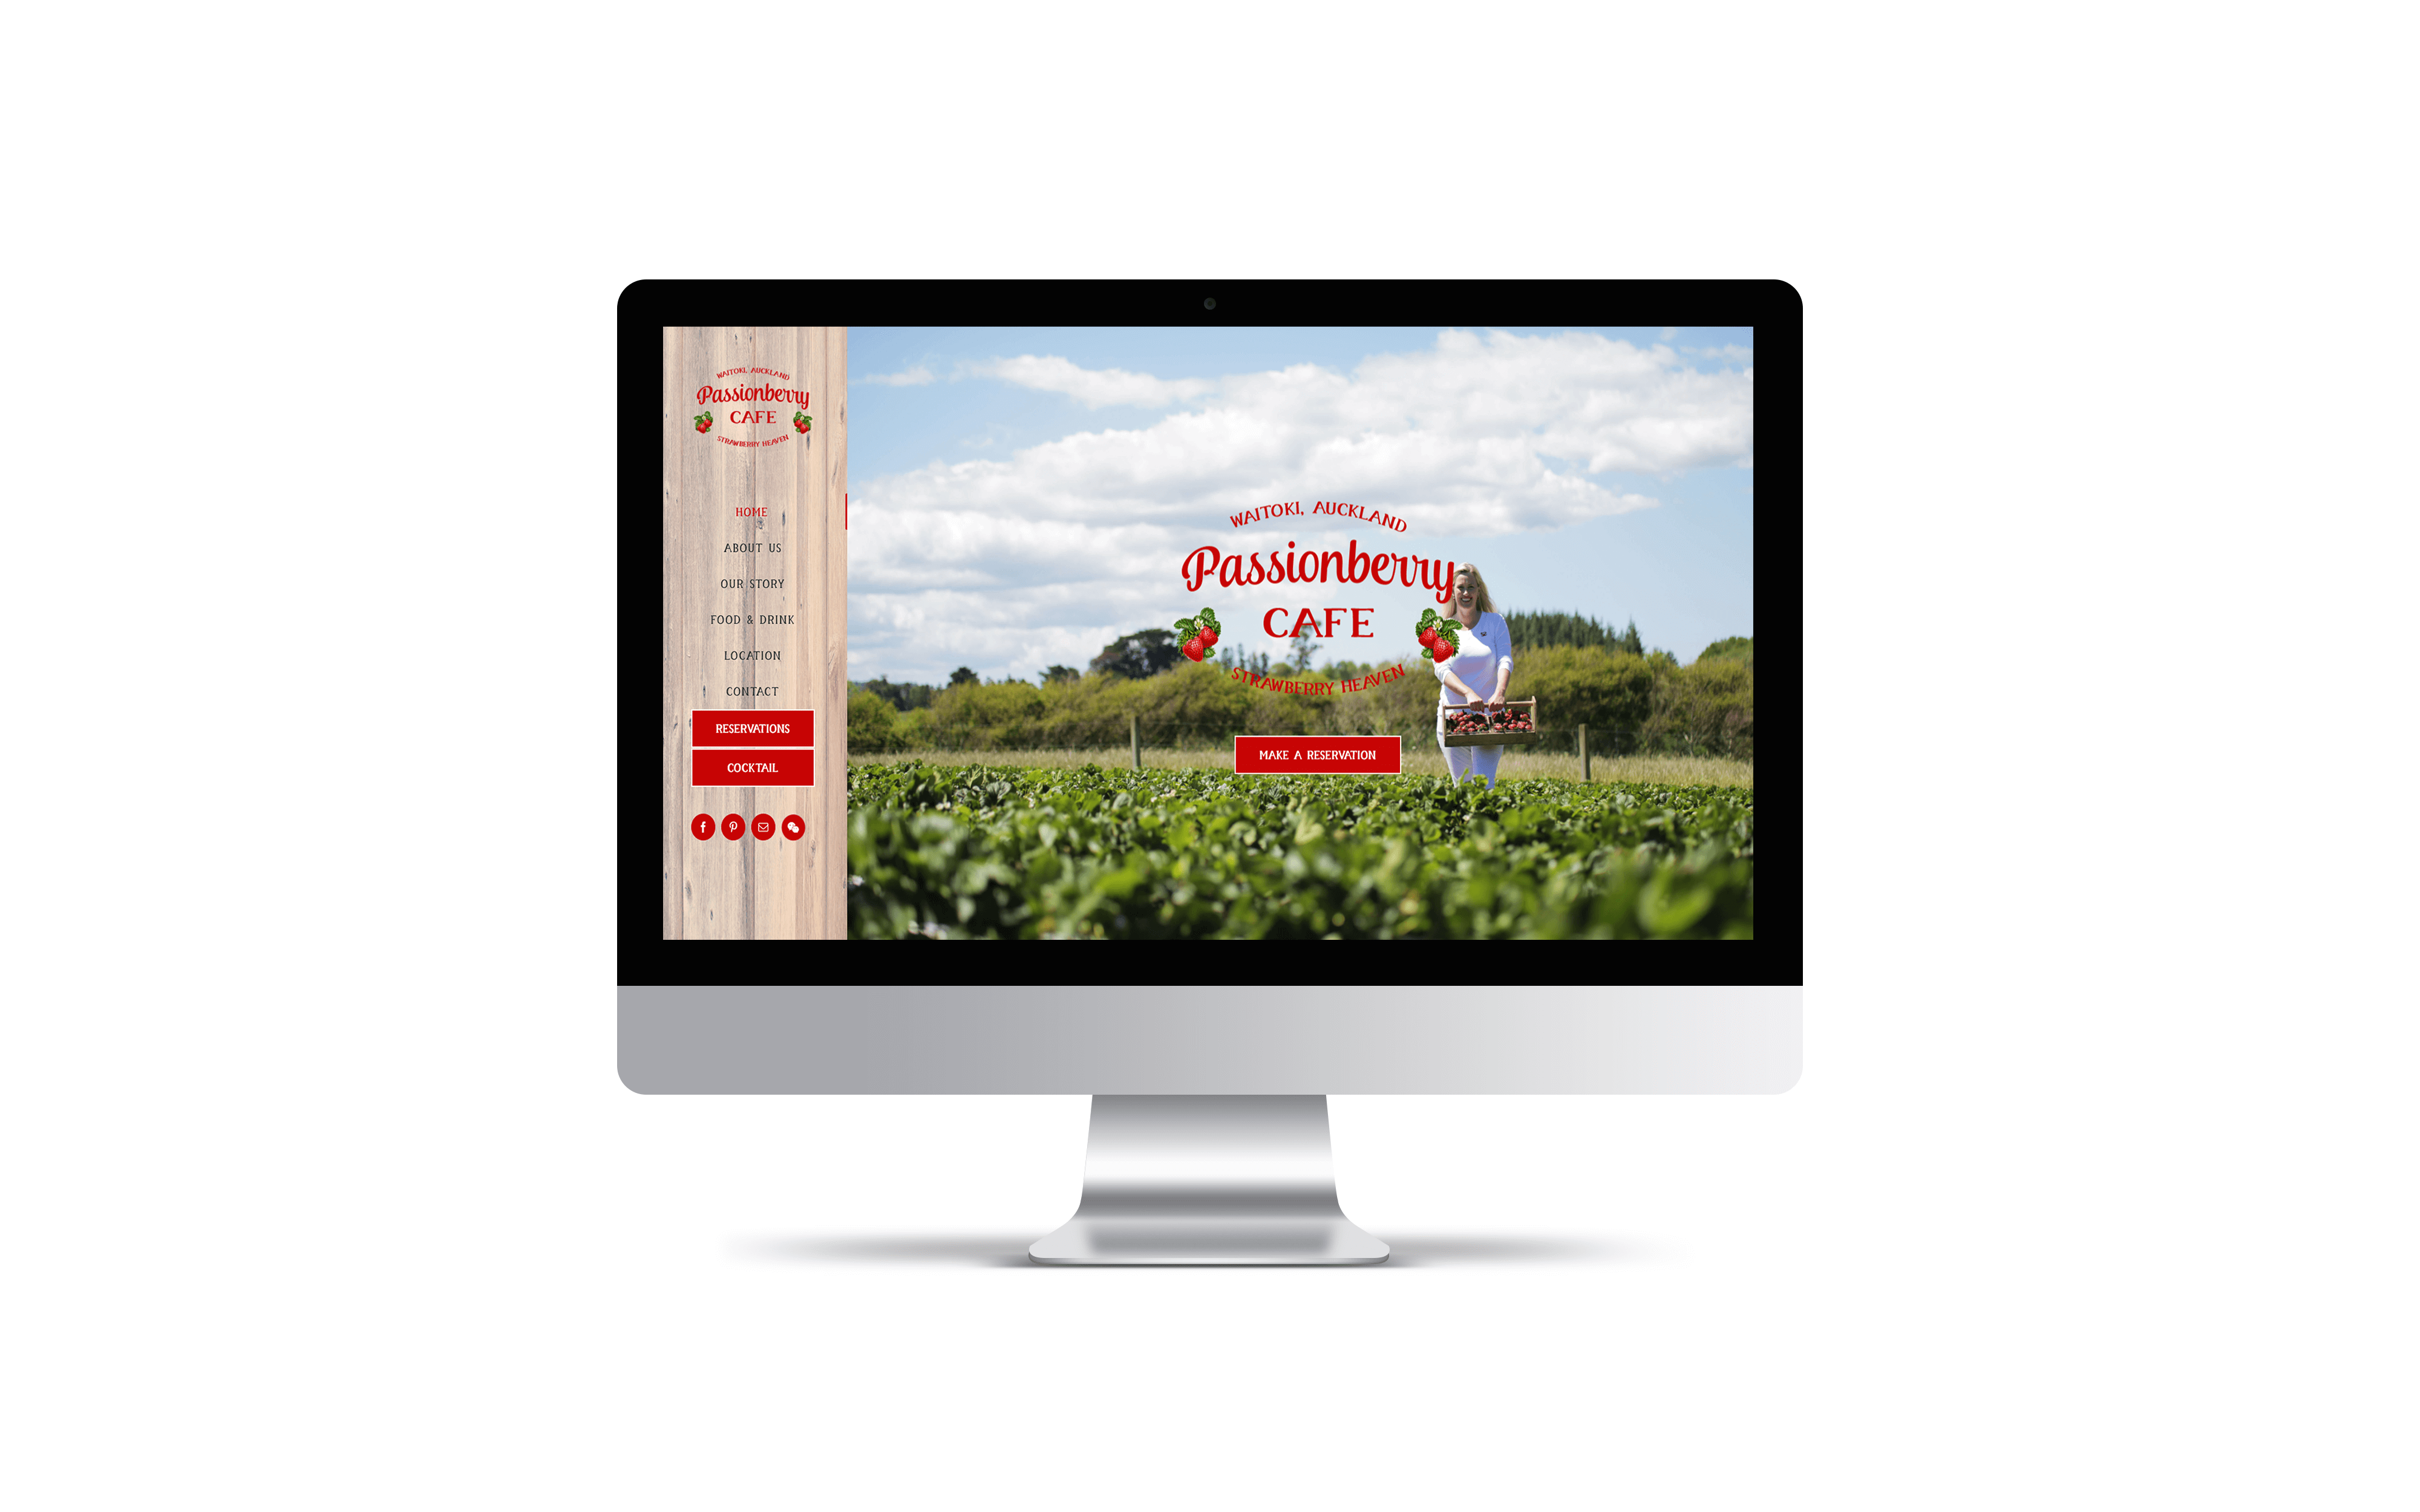 Website: Passionberry Cafe